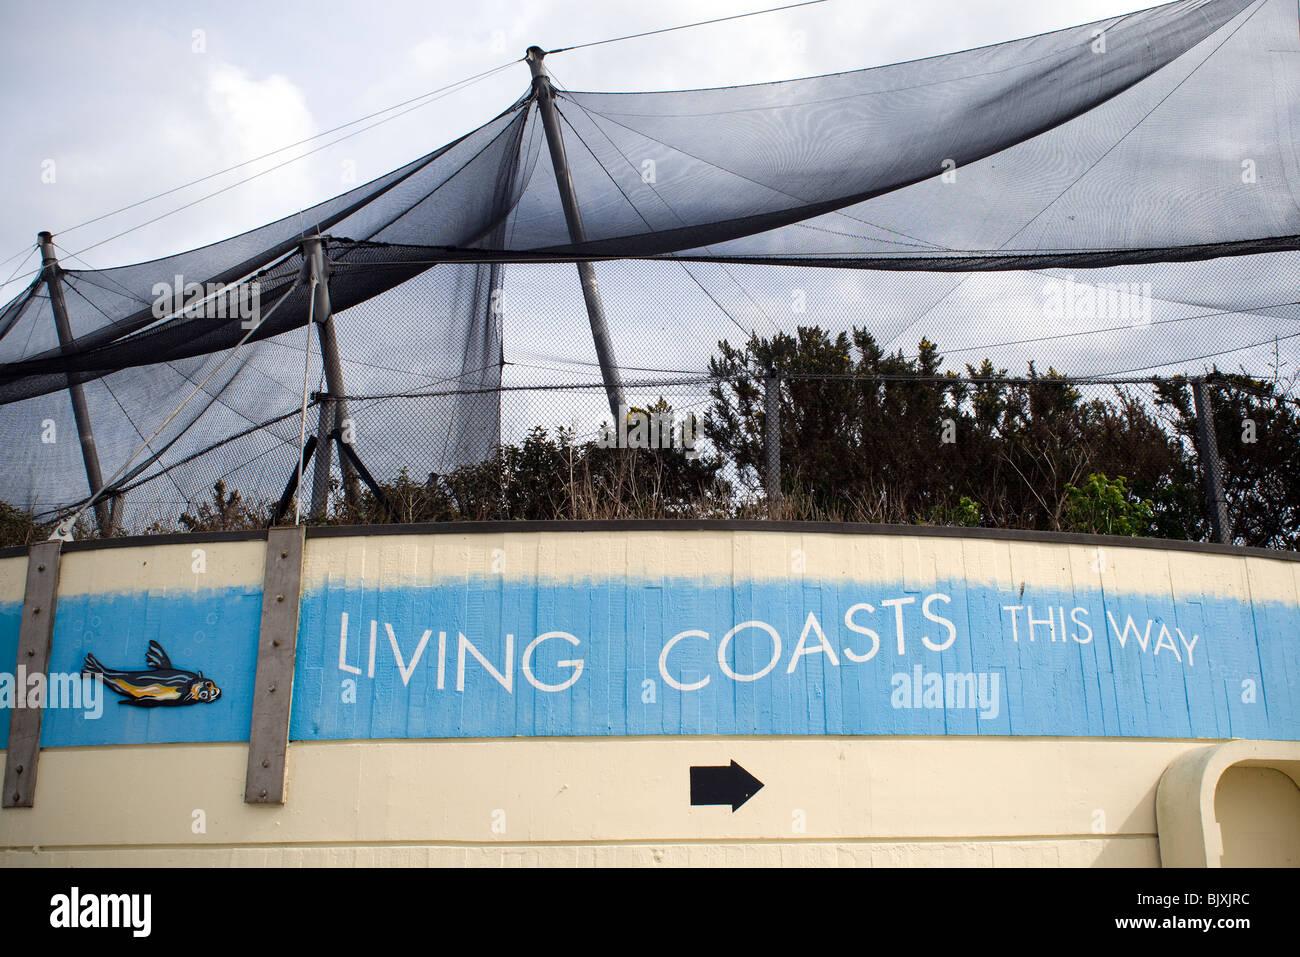 Living Coasts,Torquay - Stock Image